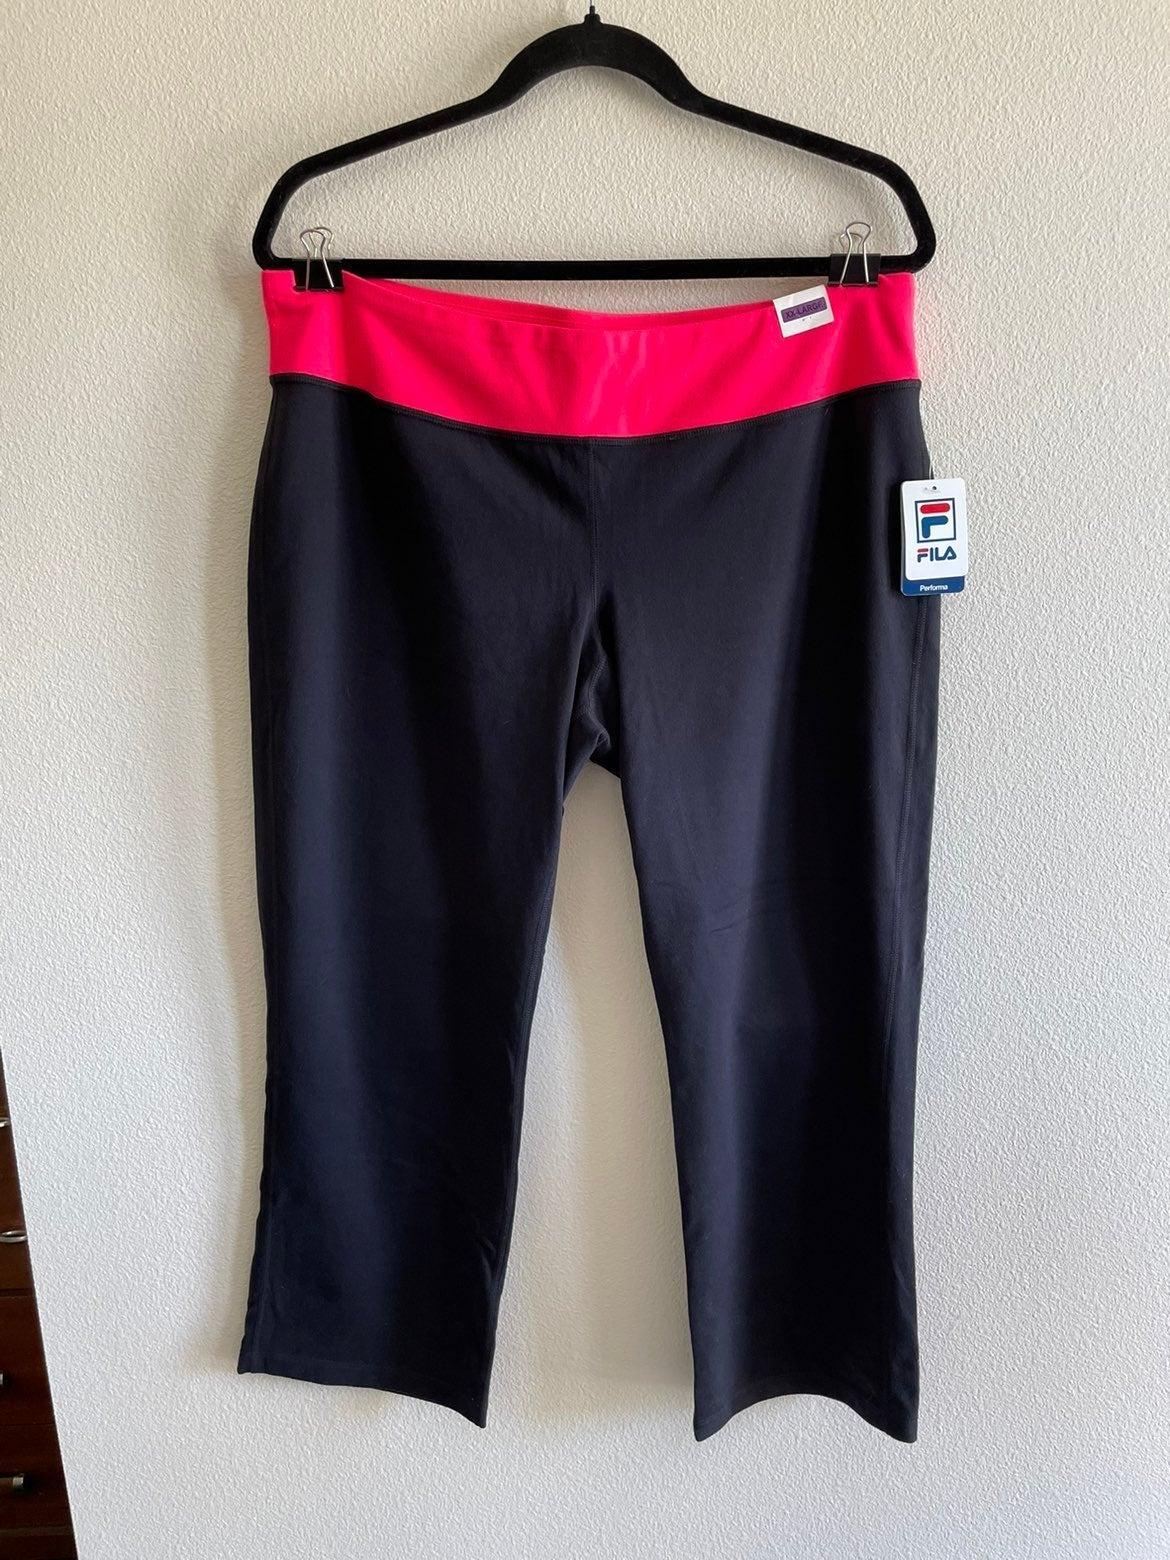 Boot Cut Capri Yoga Pants